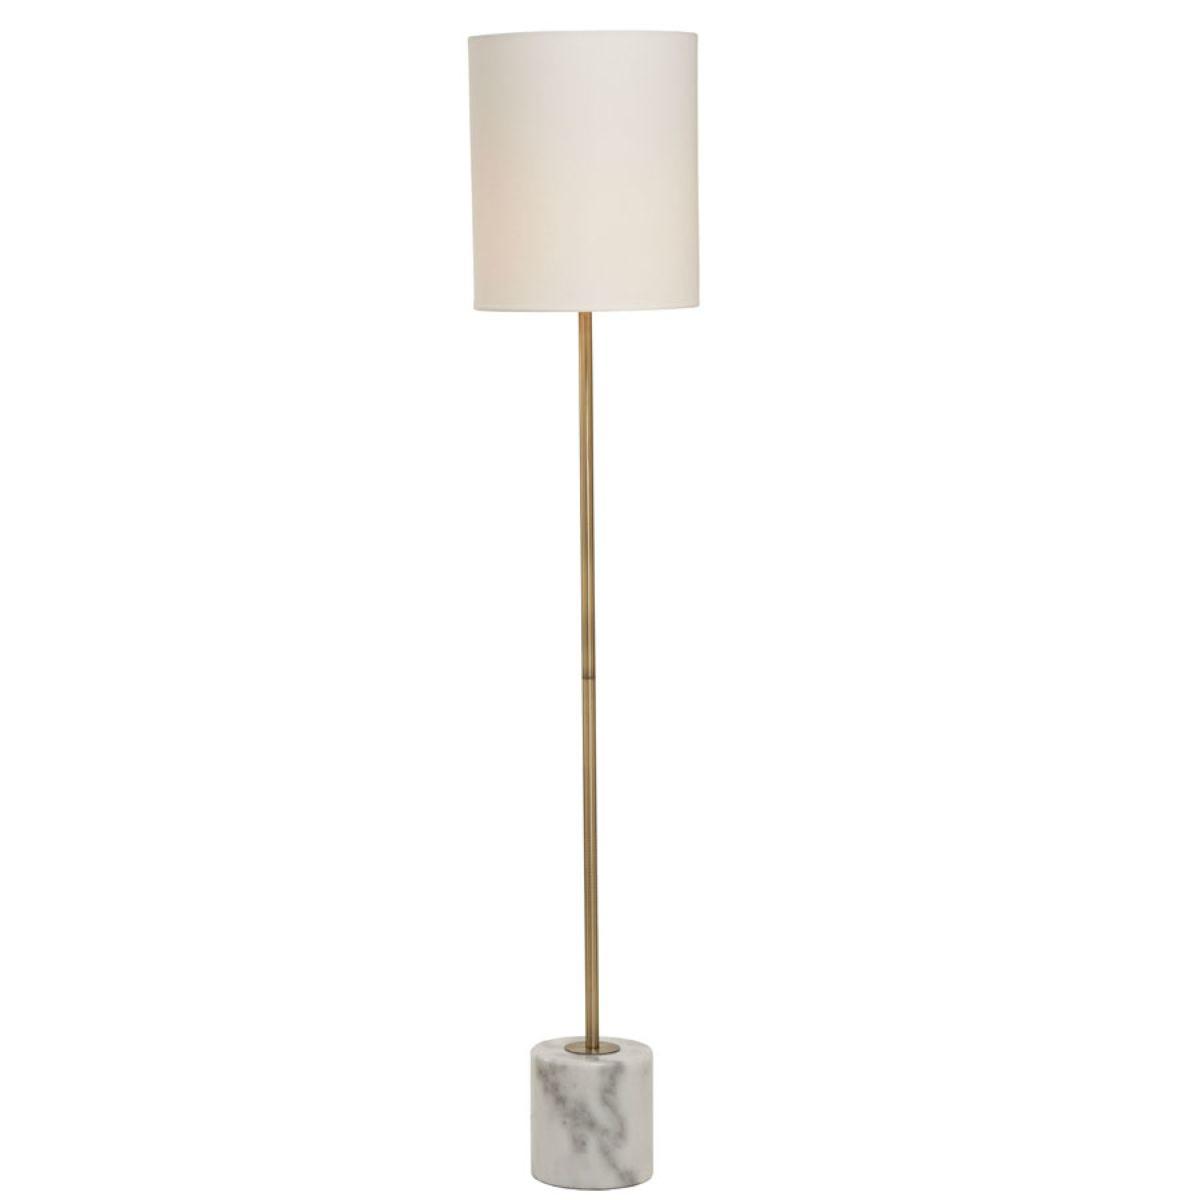 Village At Home Bianco Floor Lamp - Antique Brass